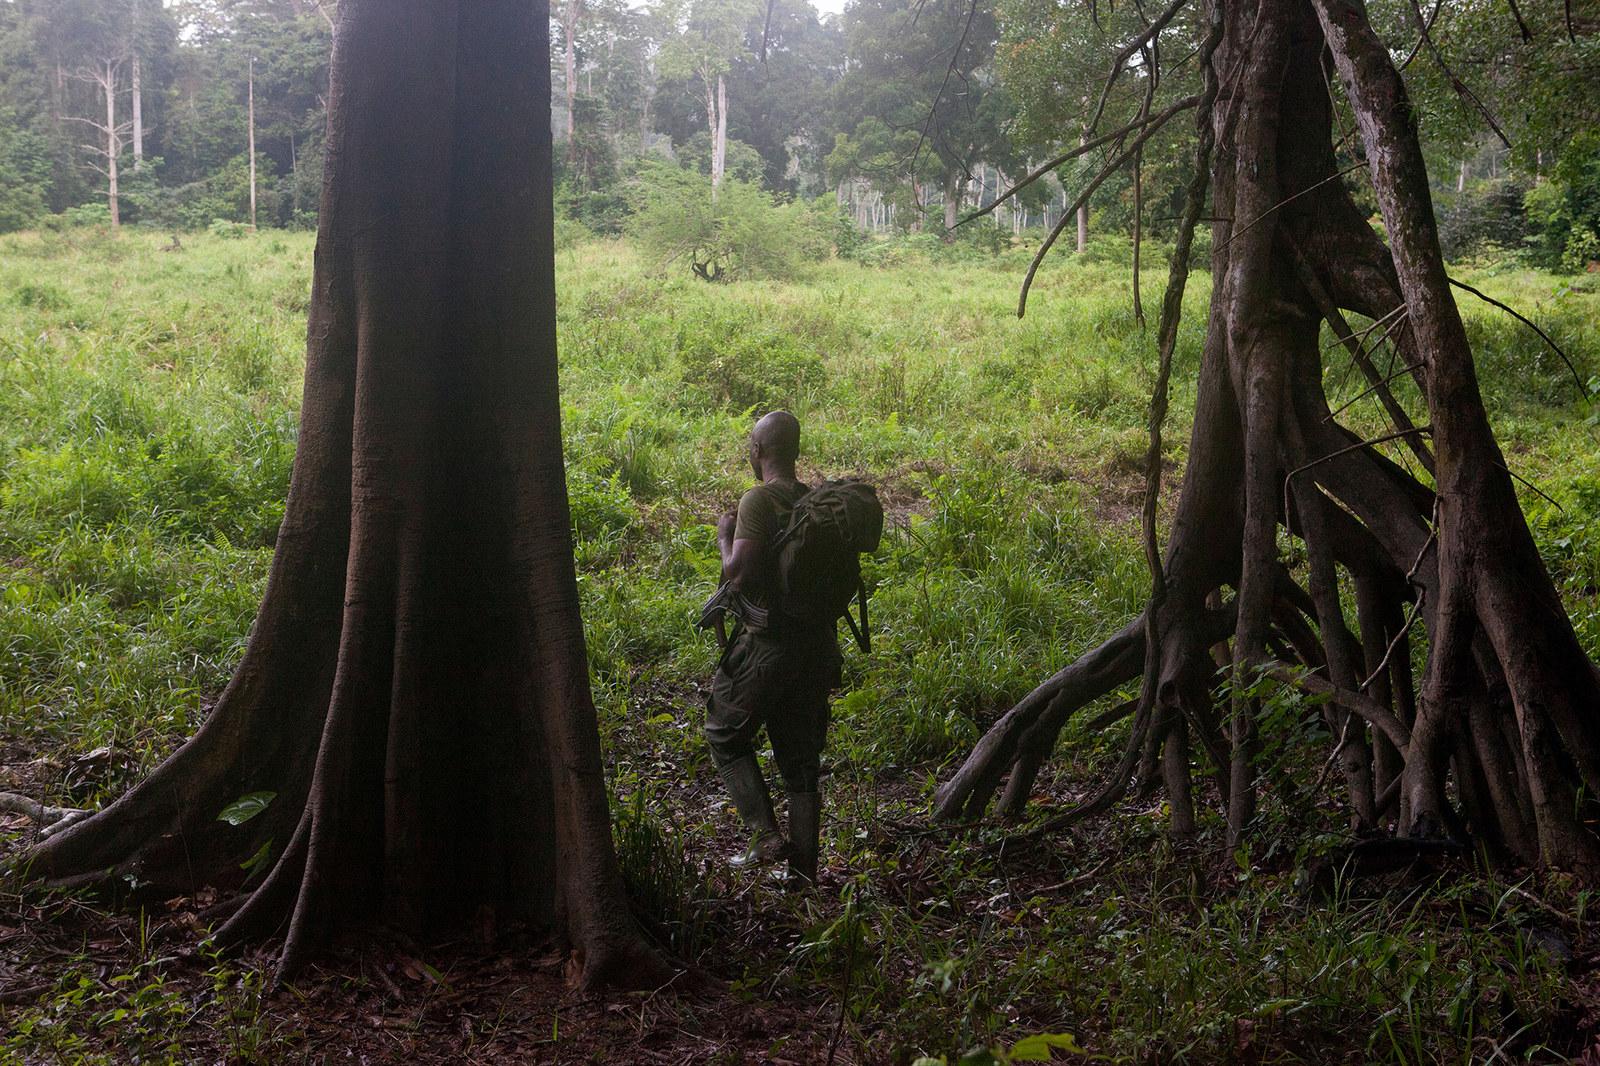 Eco-guards on patrol near Messok Dja.